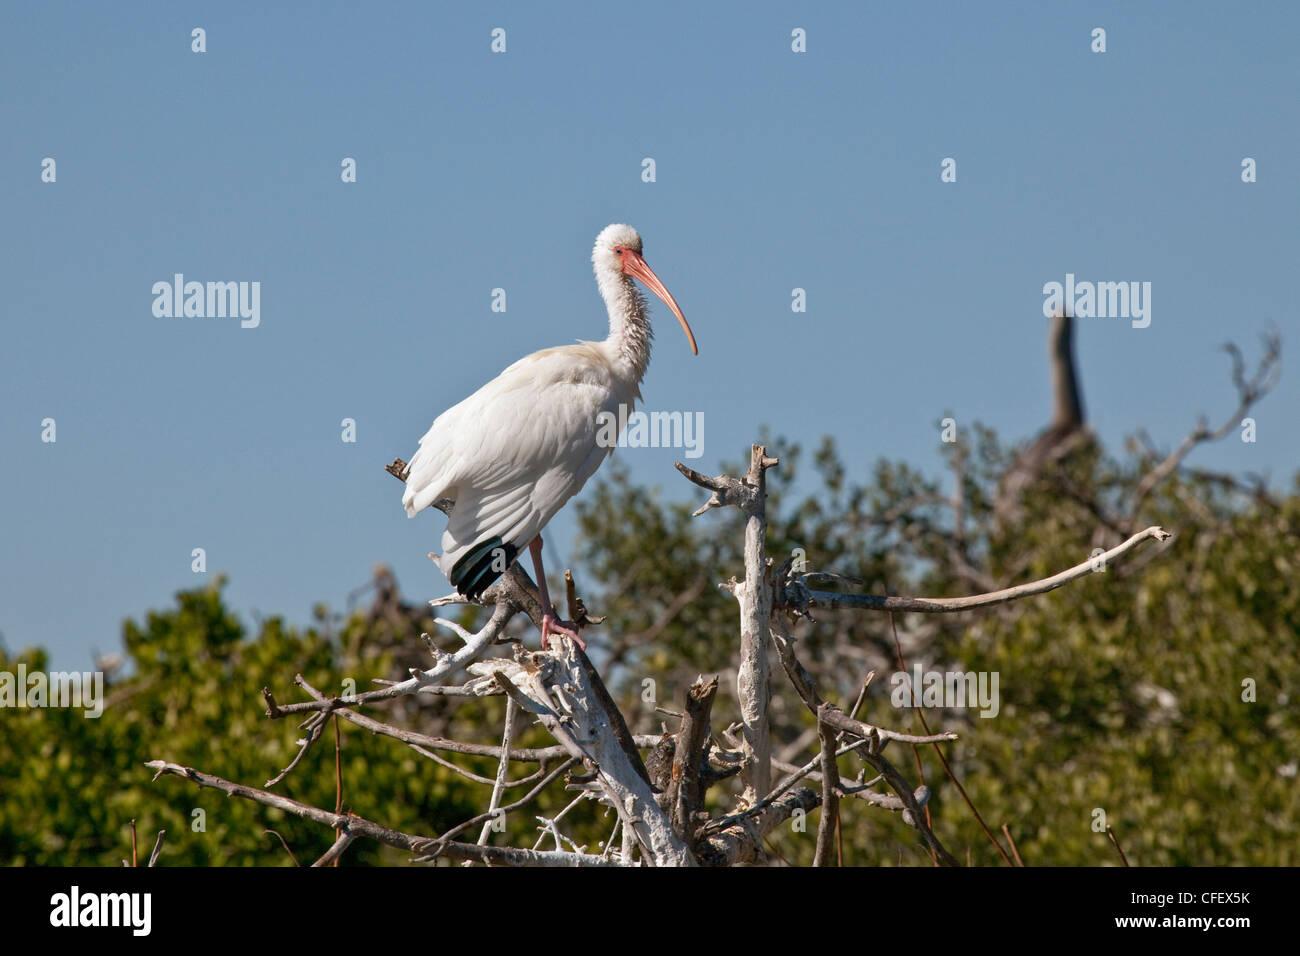 White ibis perched on Pelican Island in the Banana River near Cocoa Beach, Florida, USA. - Stock Image